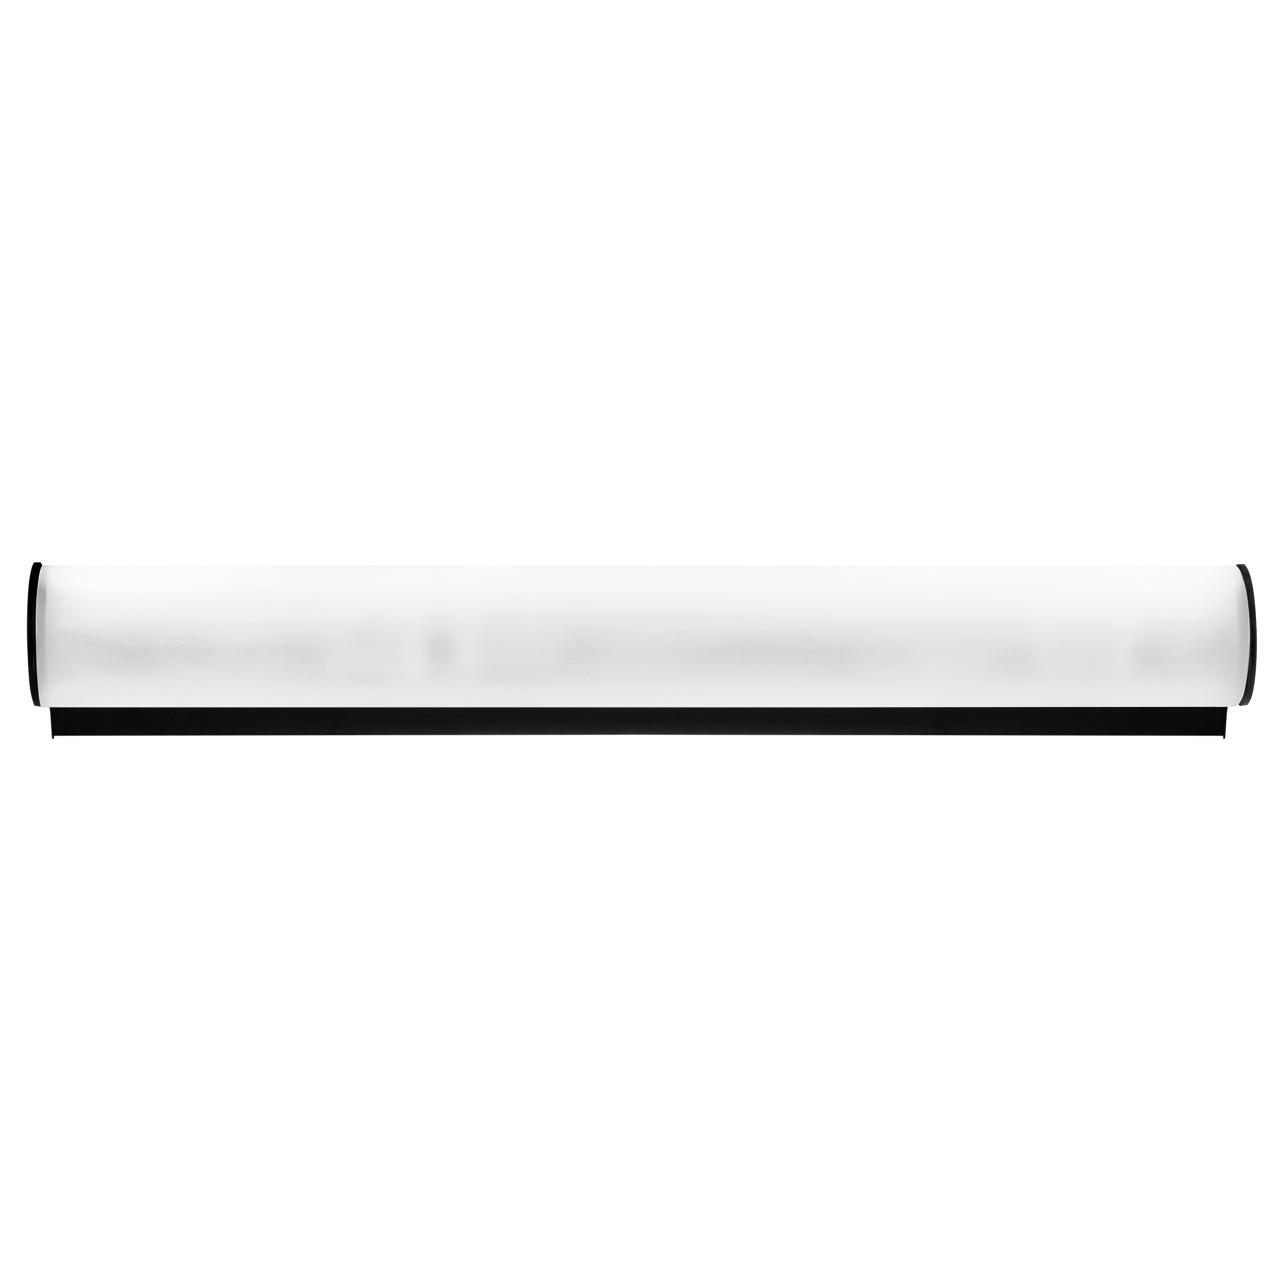 Светильник настенный Blanda 3х40W E14 черный / белый Lightstar 801837